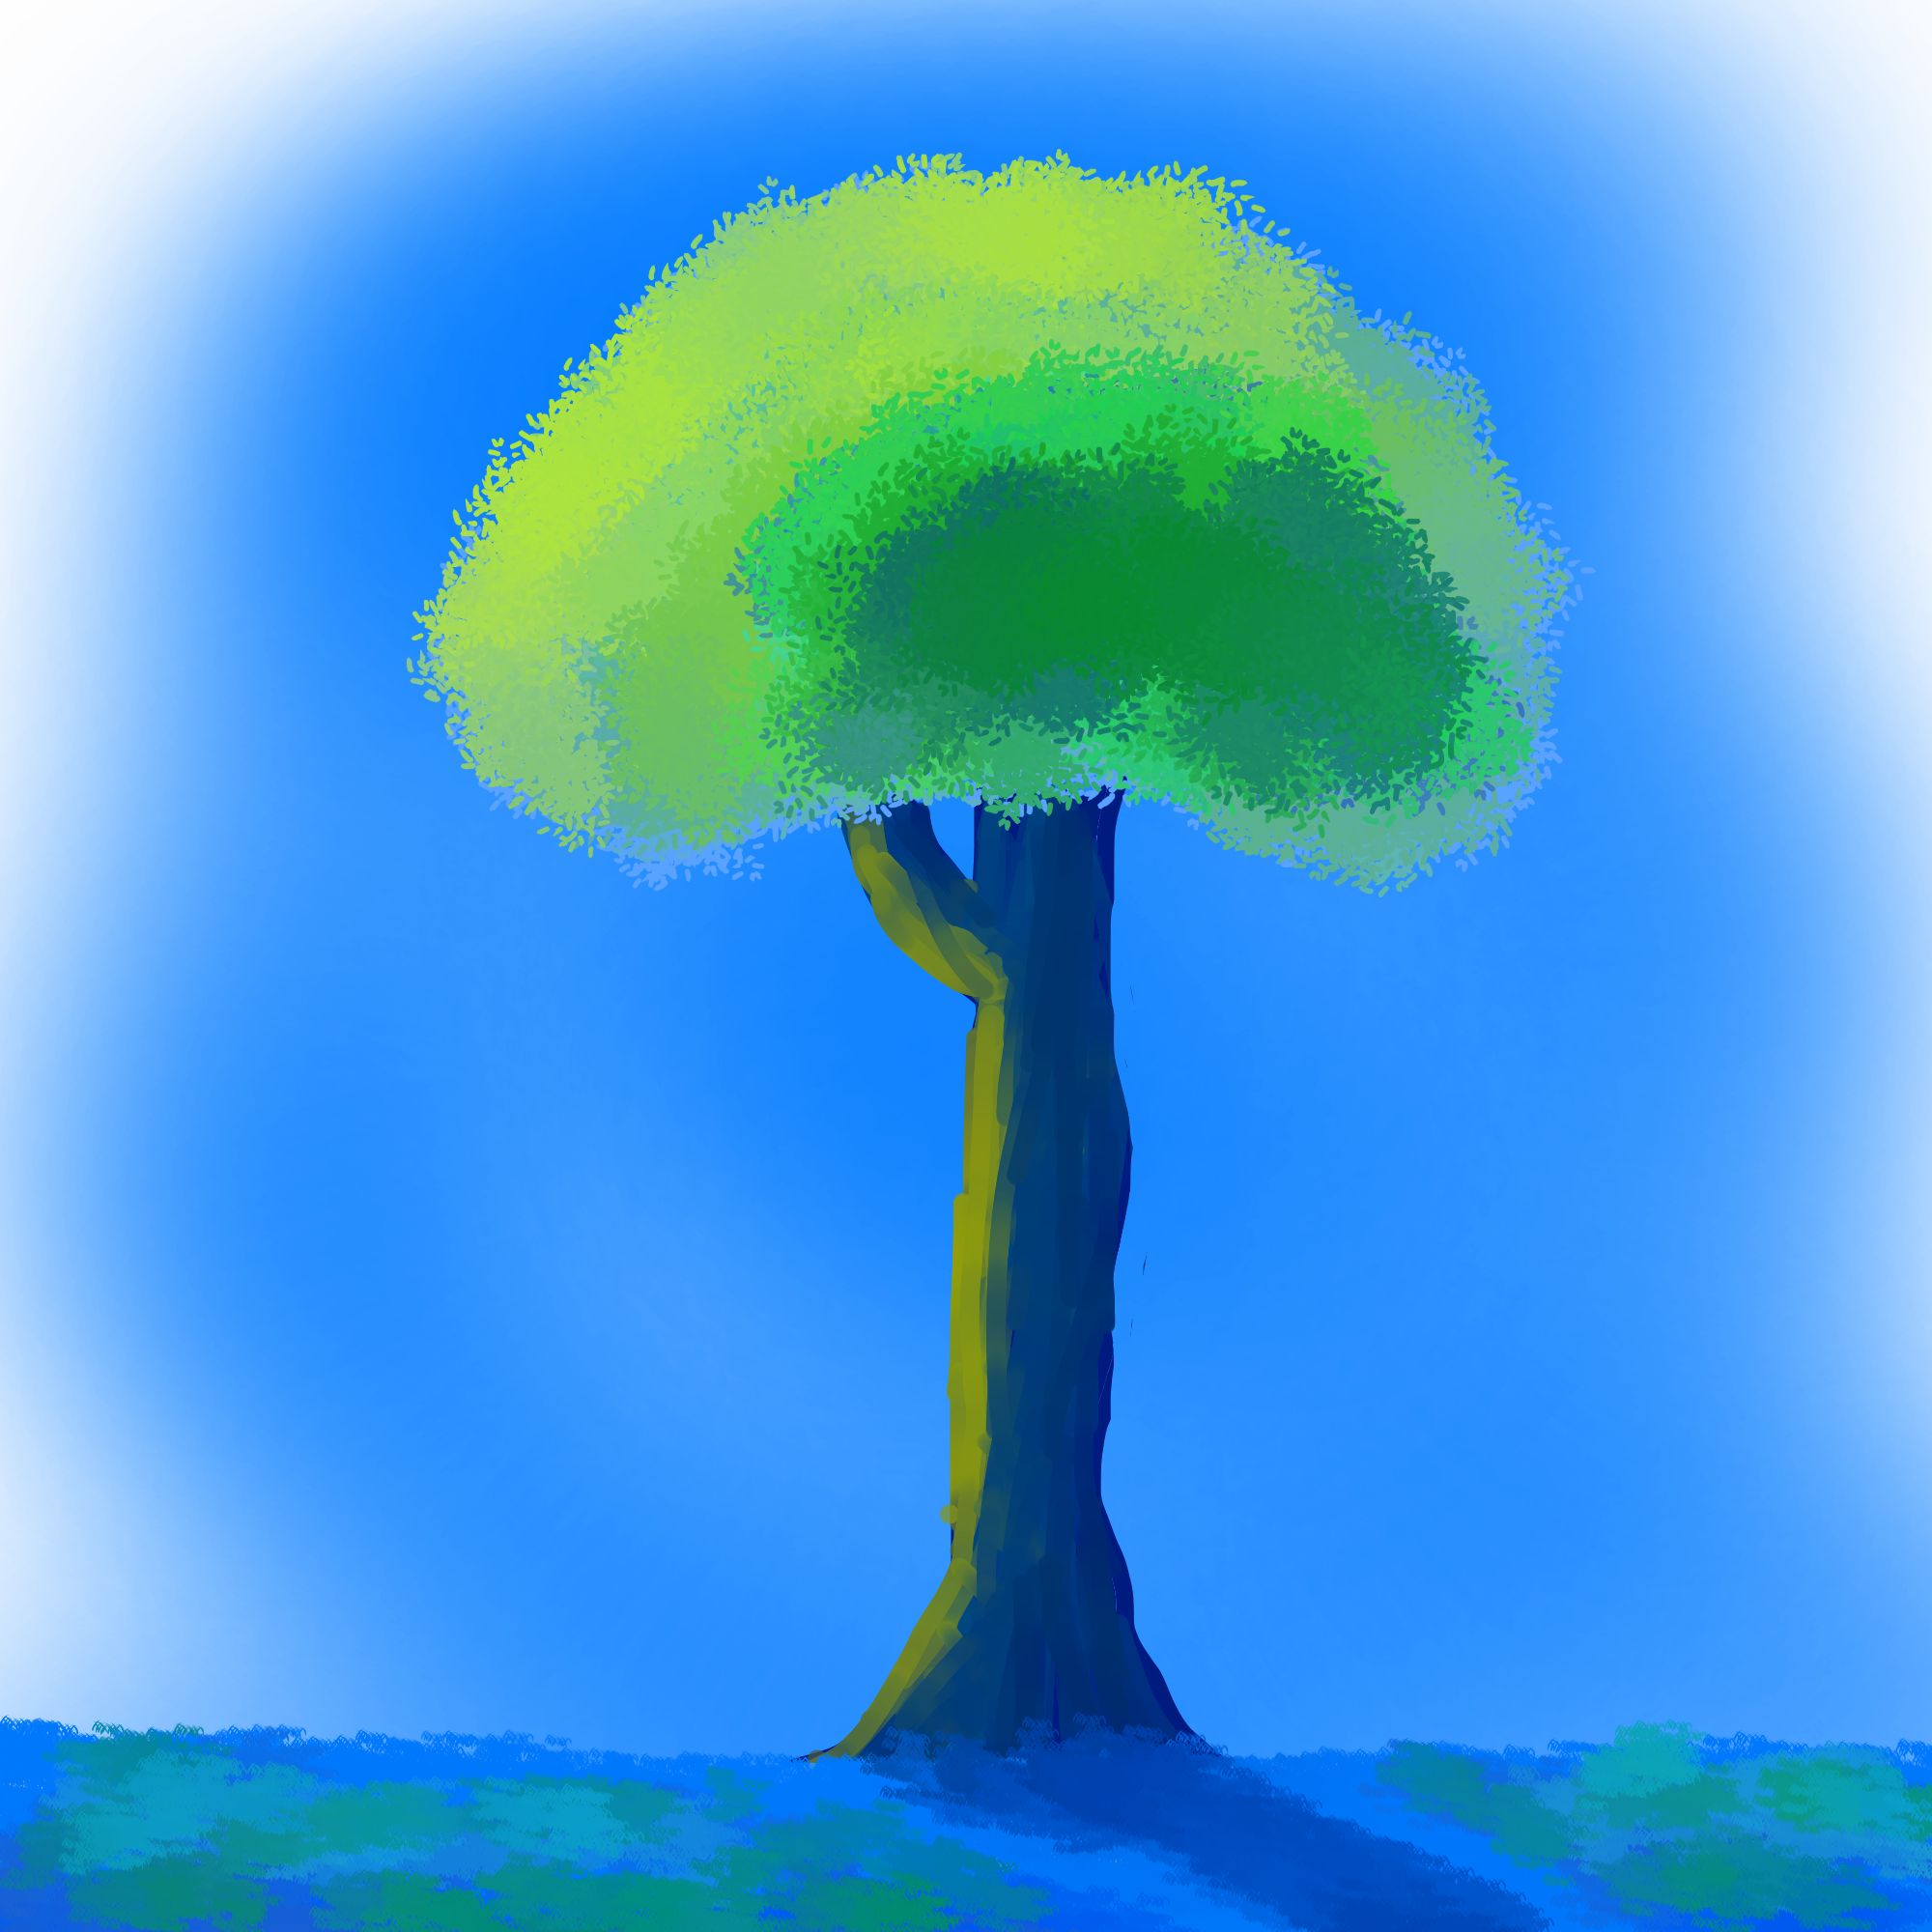 Anime style tree